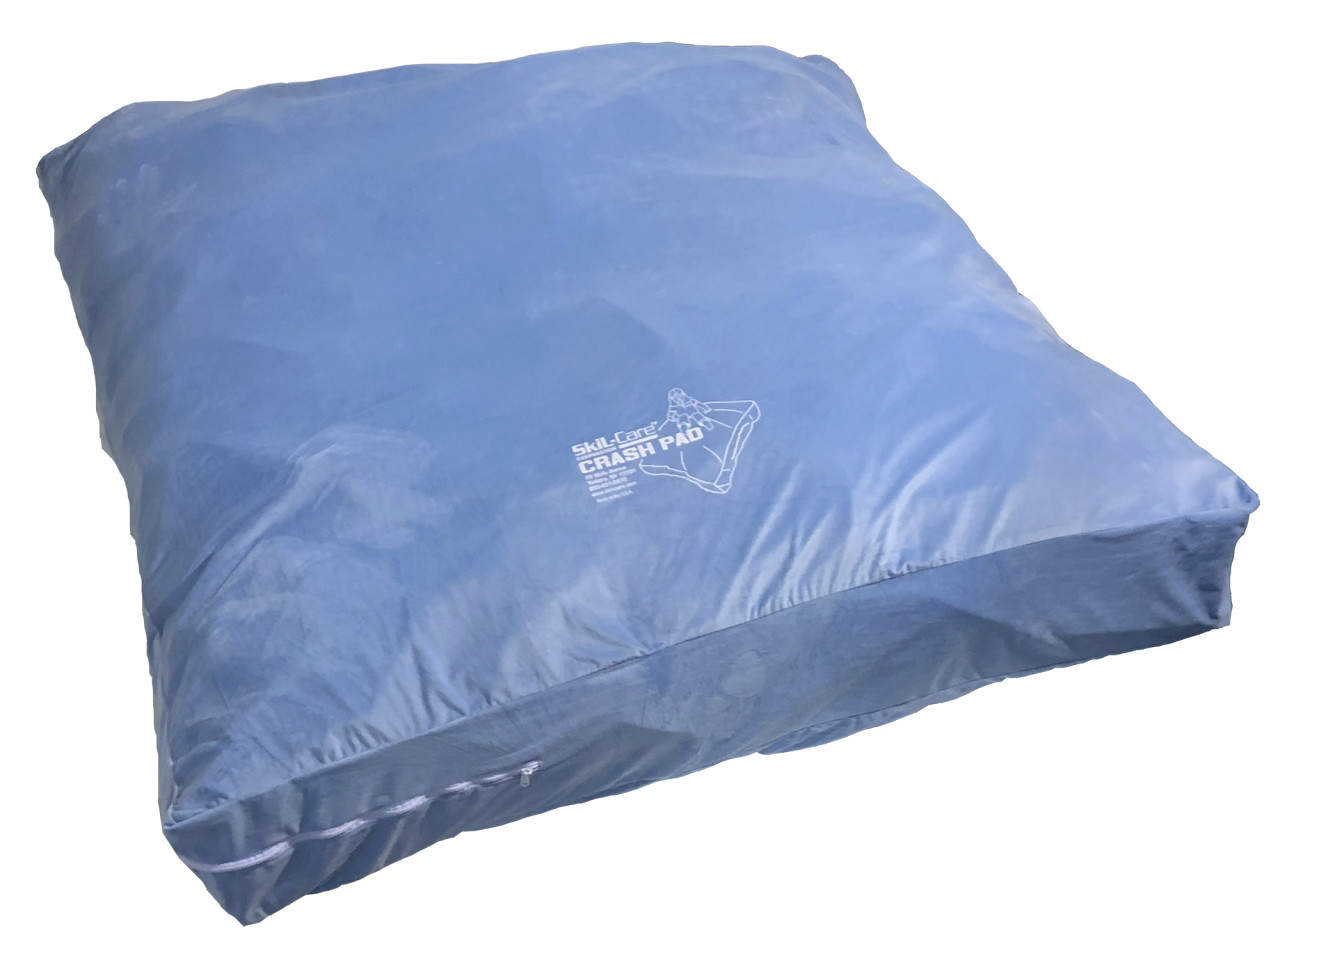 Cozy Cloth Crash Mat Cover - Large